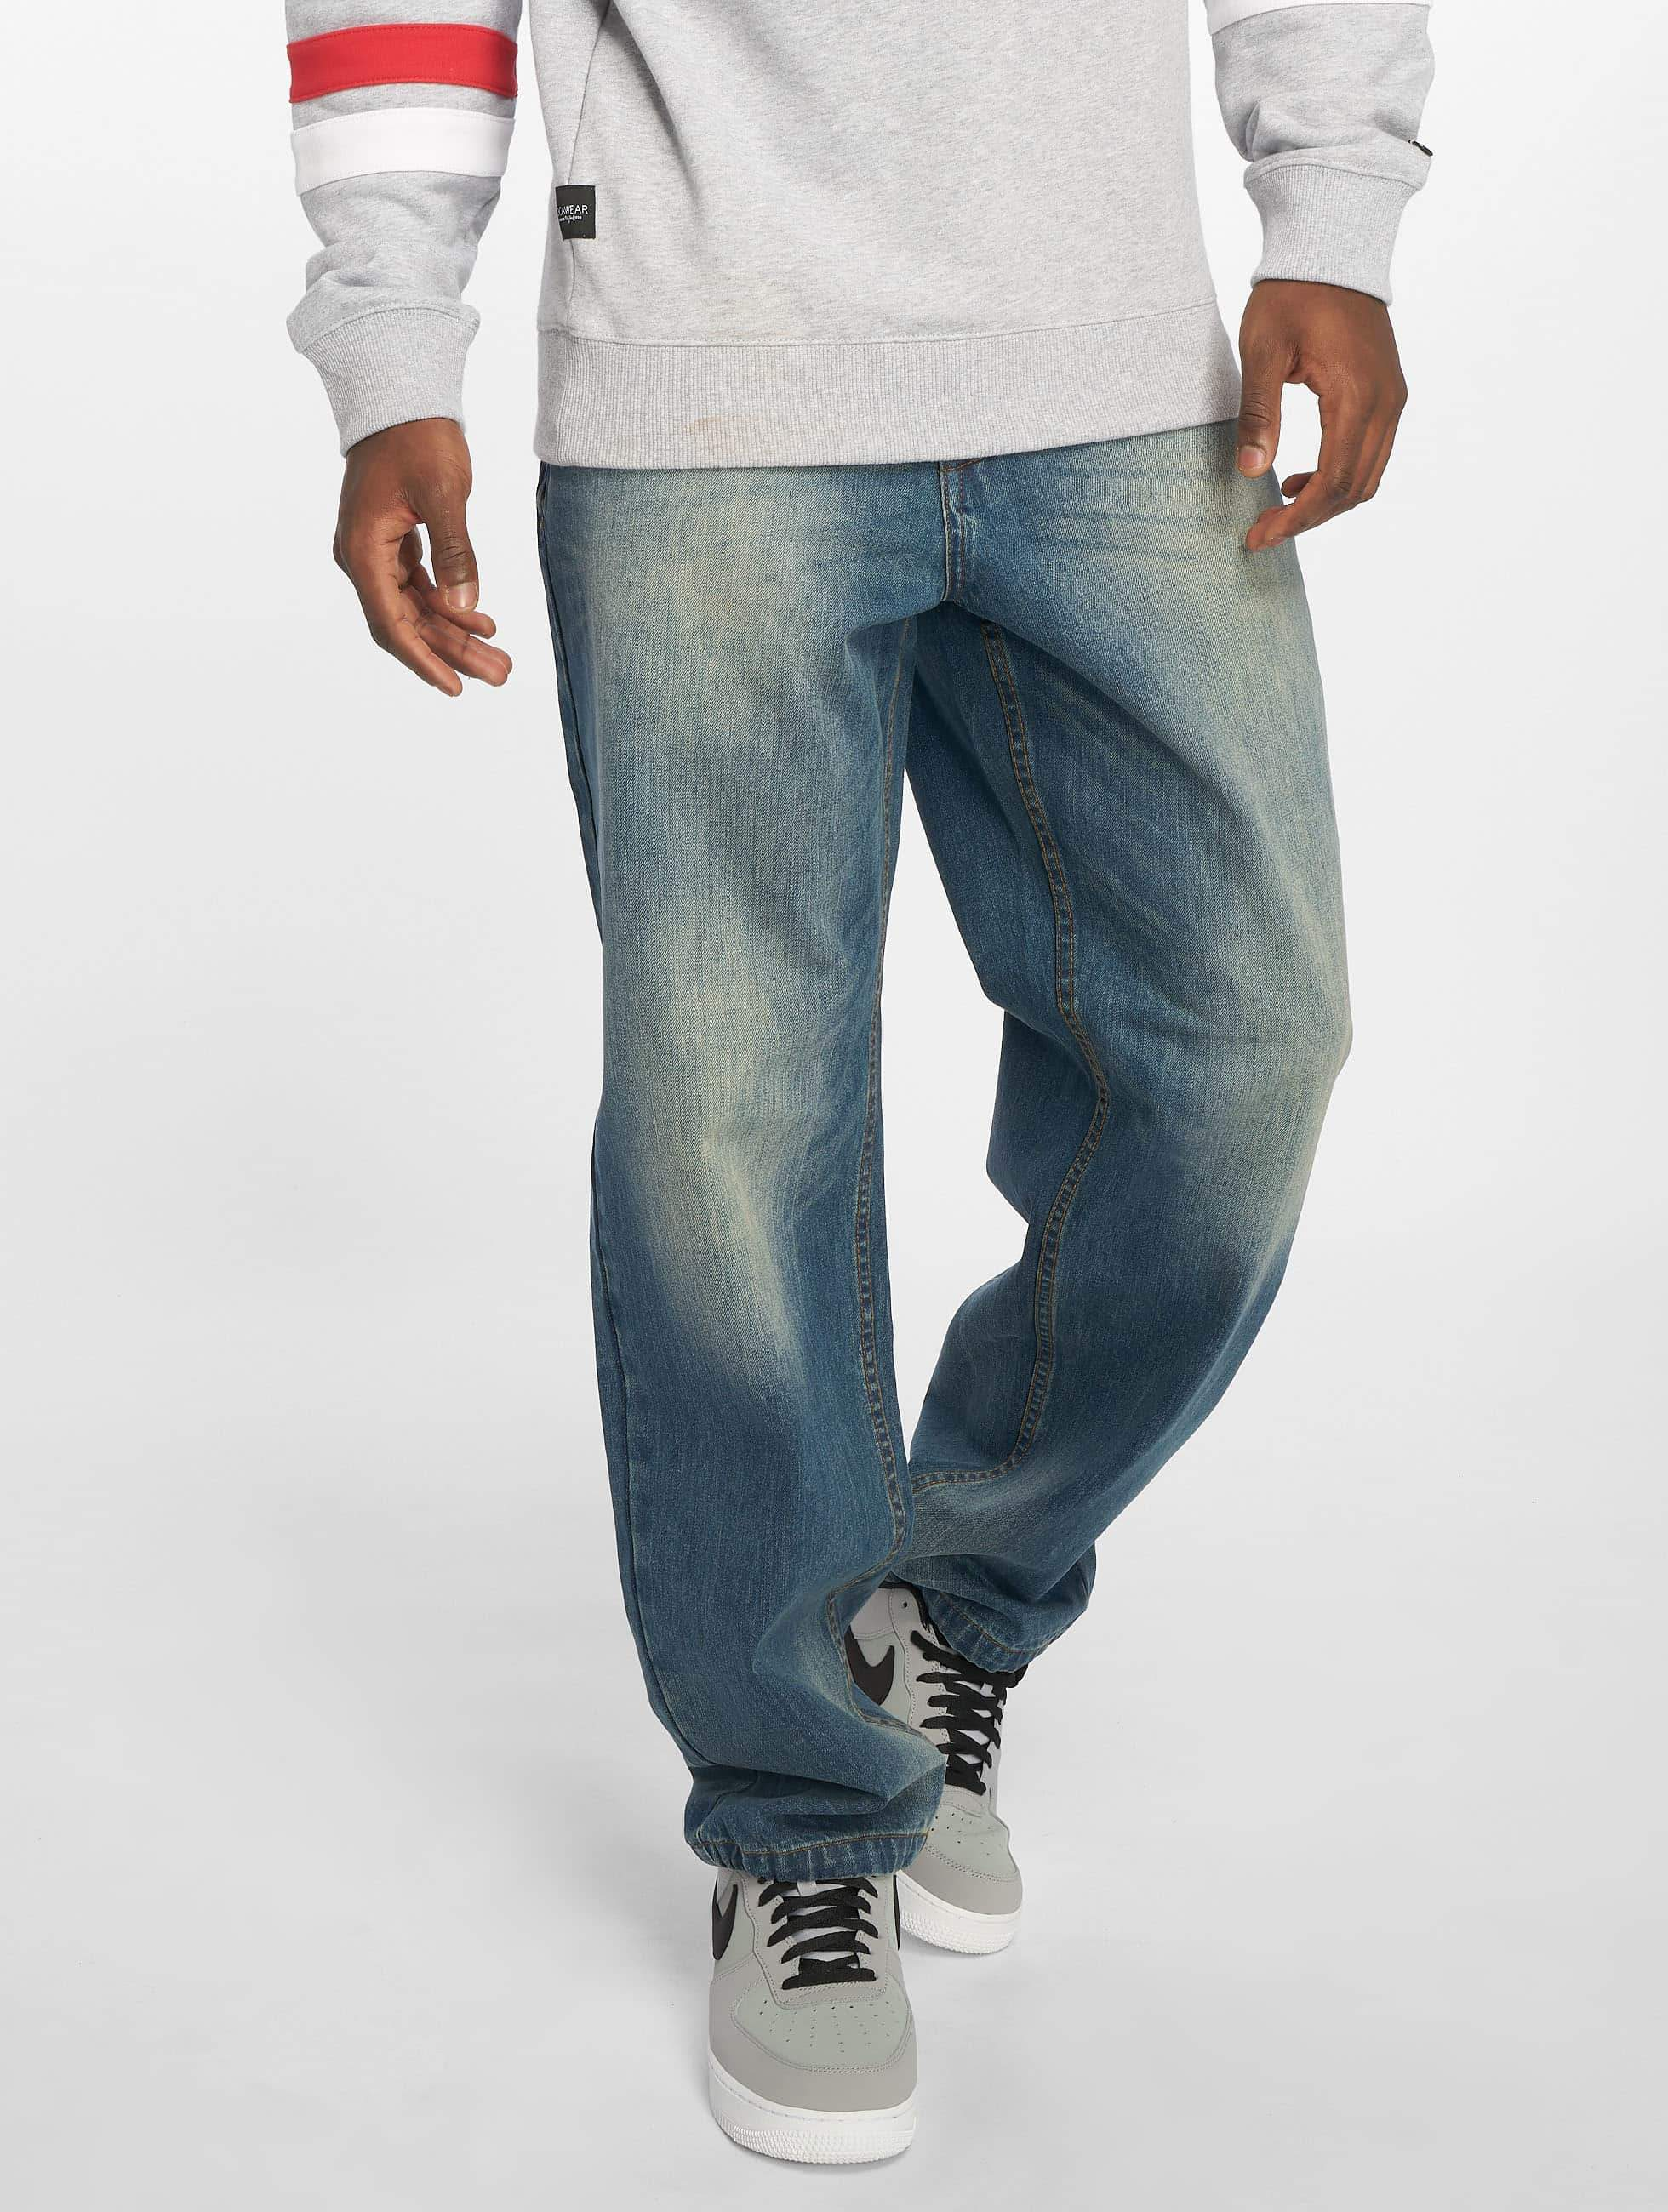 Rocawear / Baggy THU in blue W 46 L 34